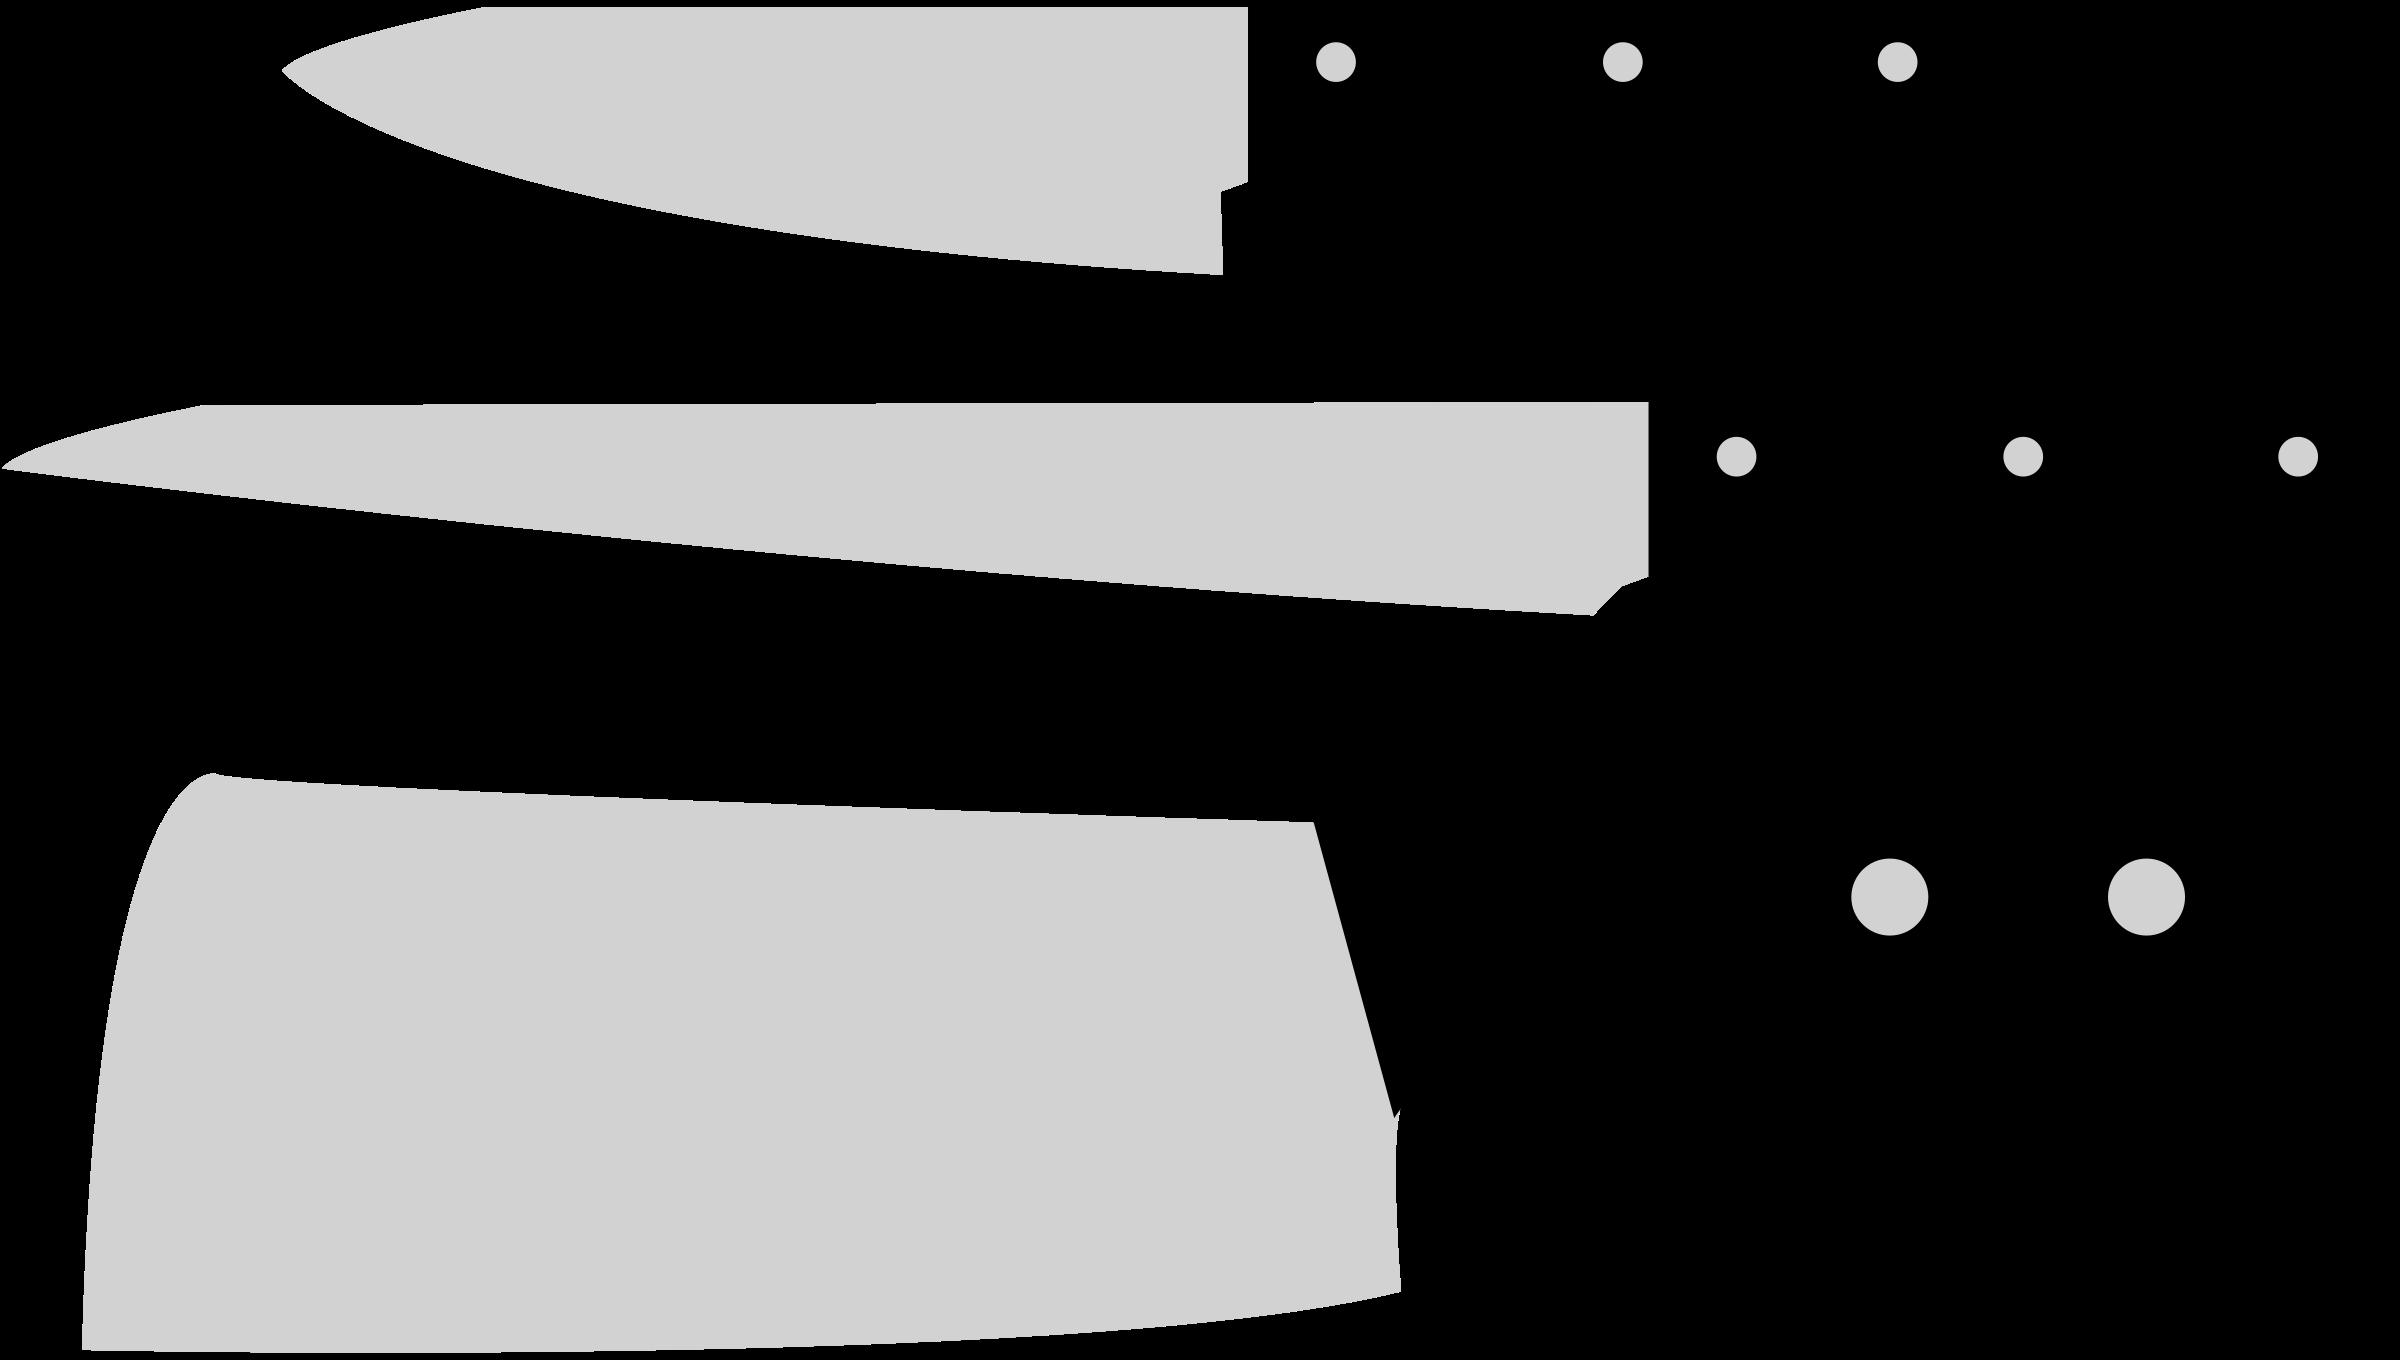 White clipart knife. Kitchen knives big image